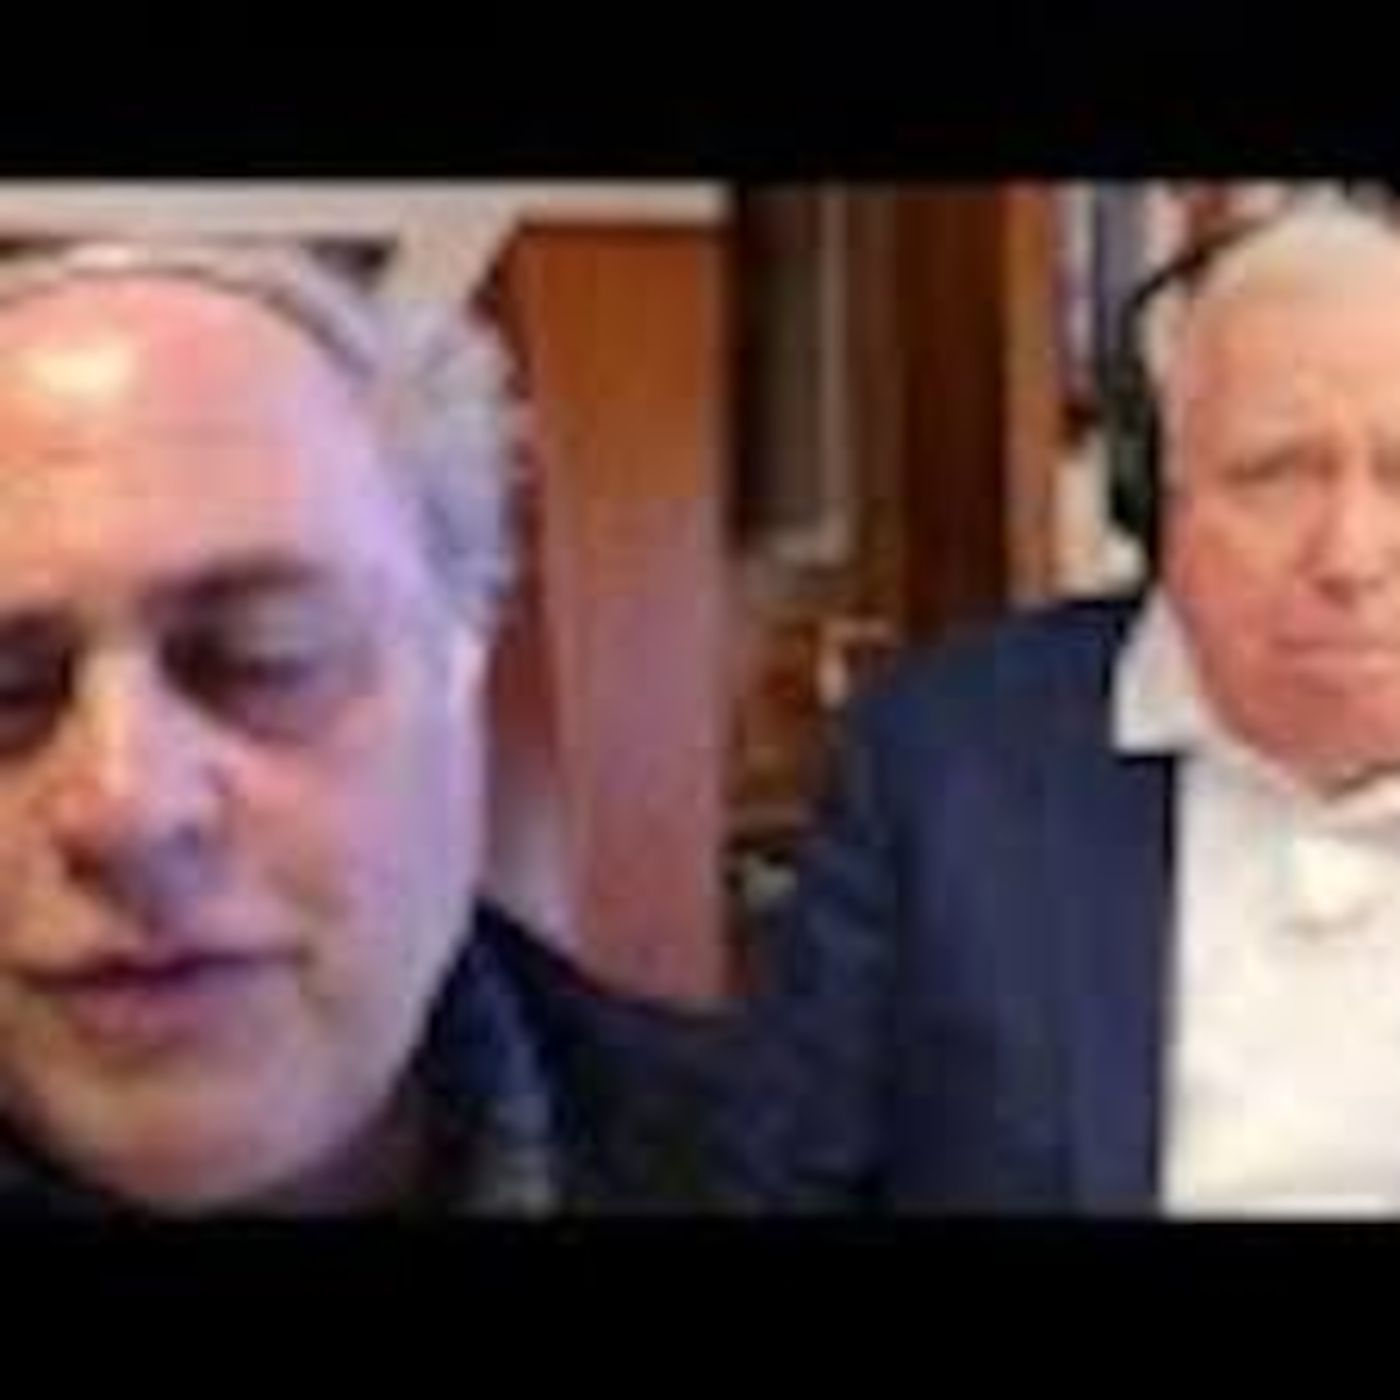 Dr. Jerome Corsi discusses Hydroxochloriquine